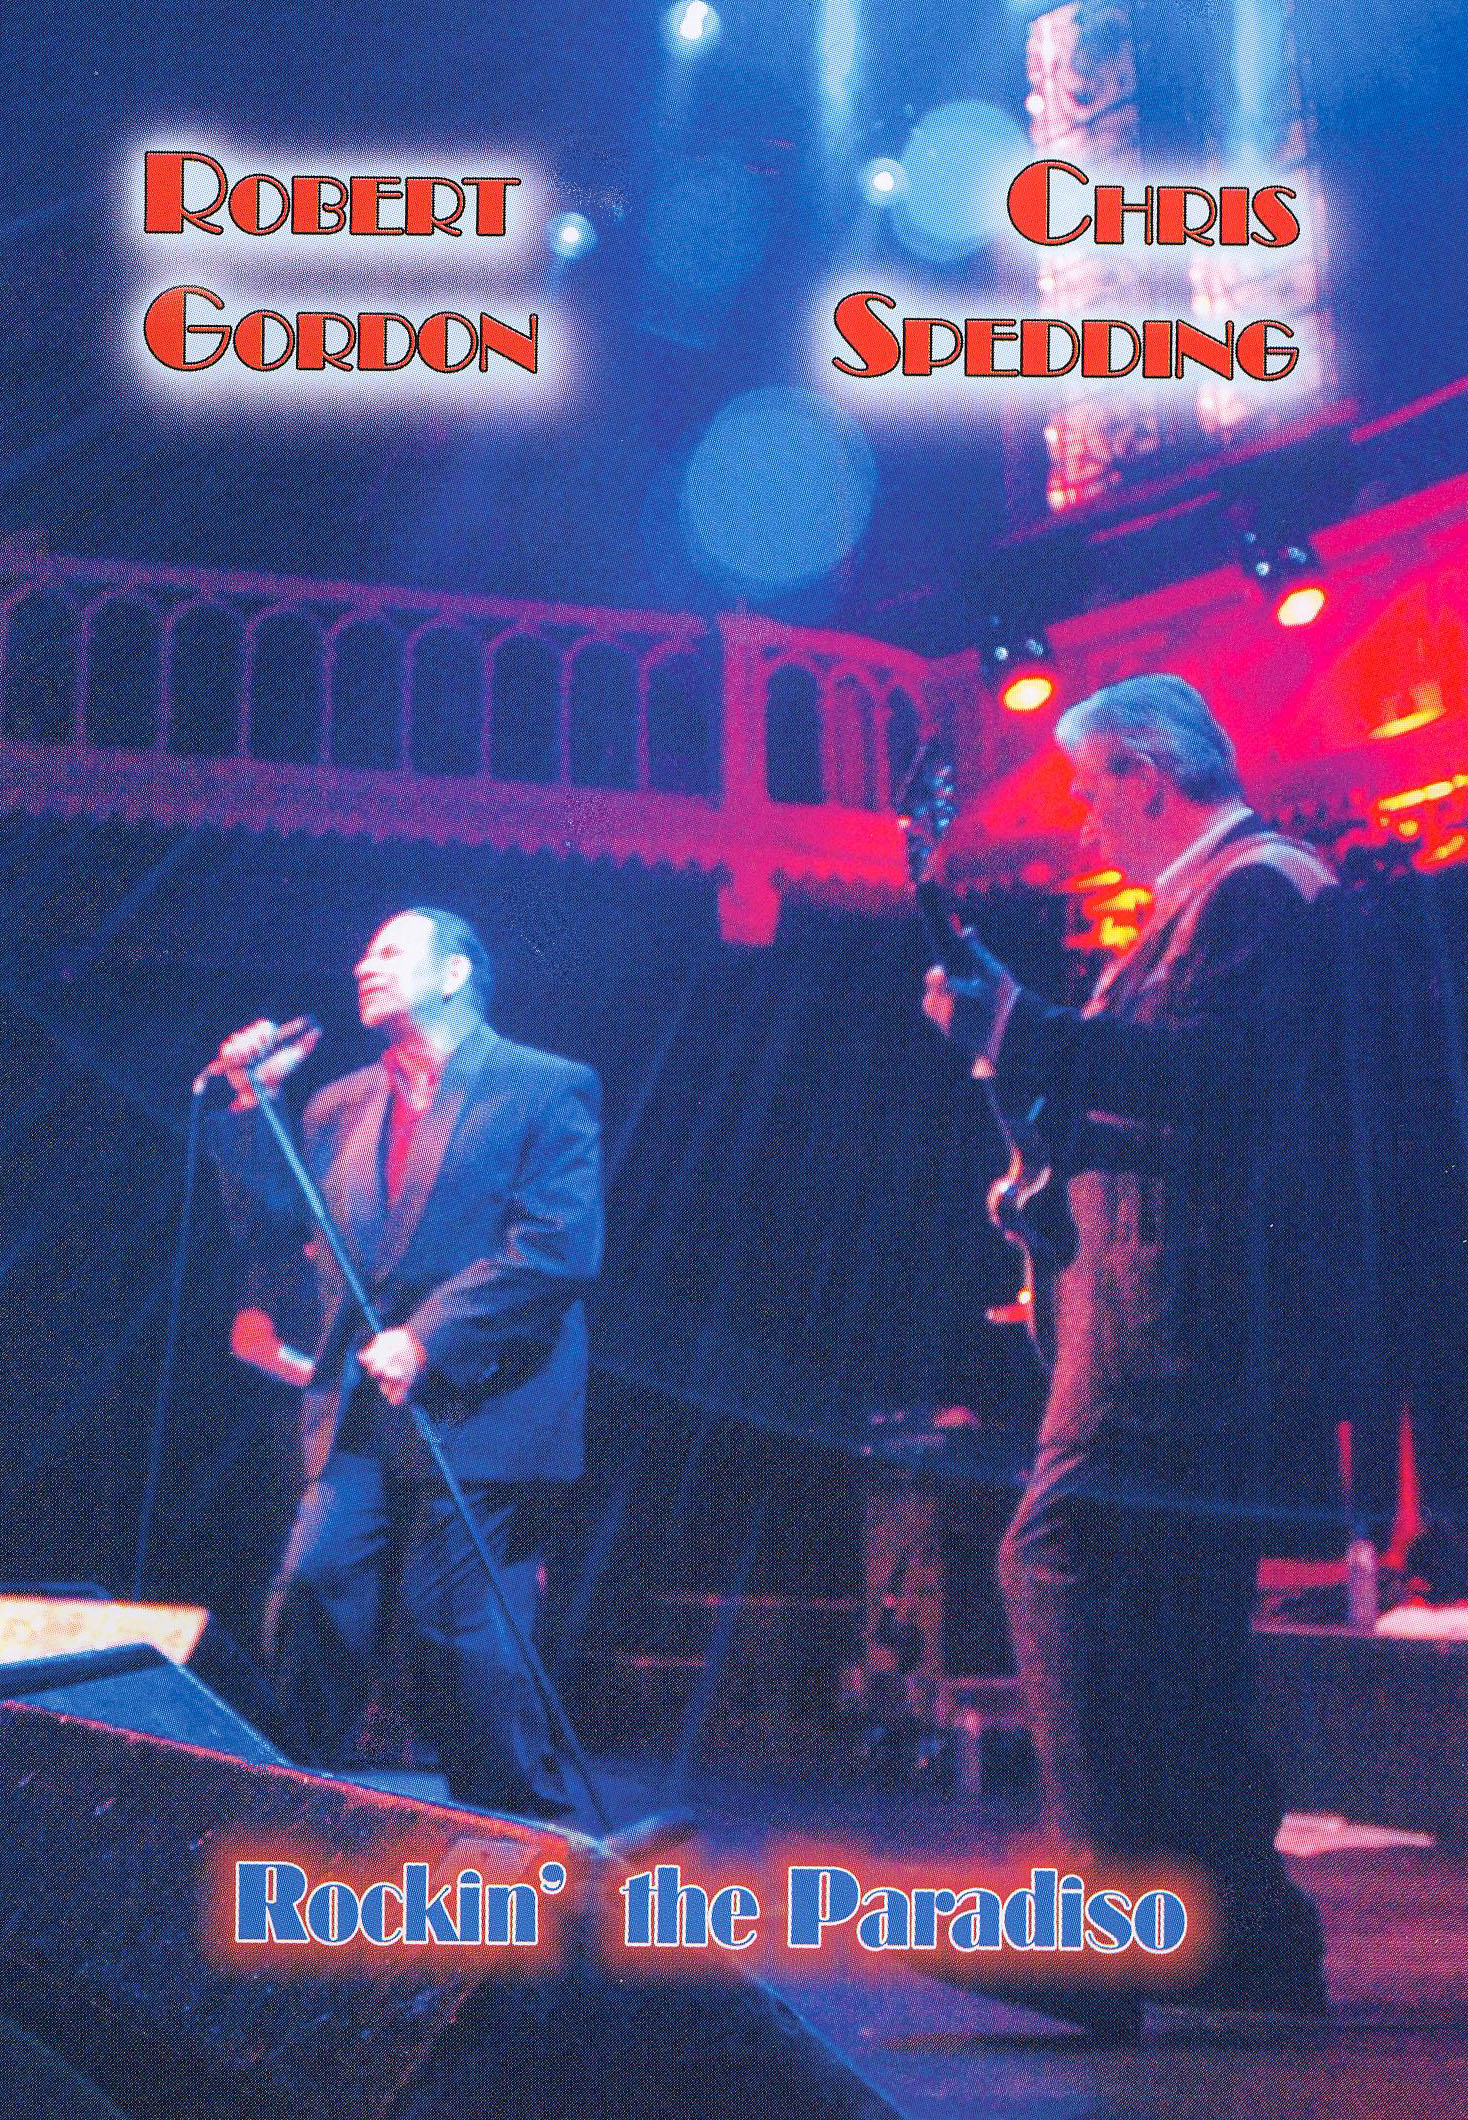 Robert Gordon and Chris Spedding: Rockin the Paradiso